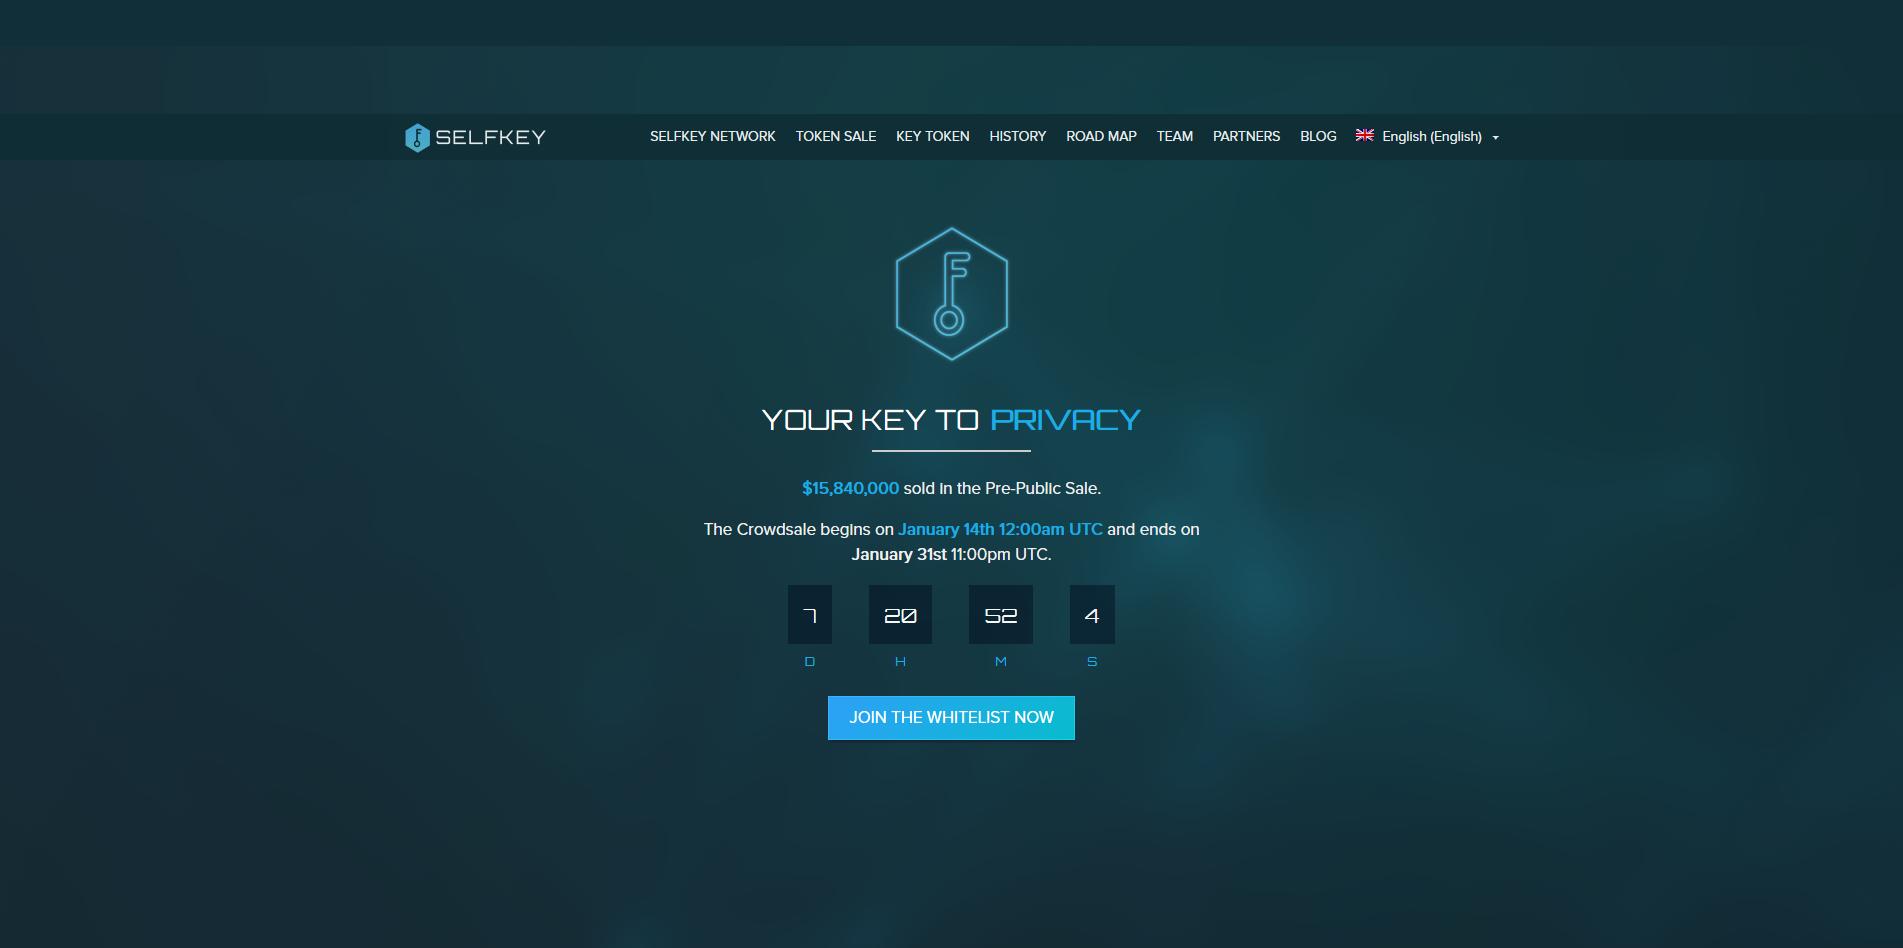 Screenshot-2018-1-7 SelfKey Self-Sovereign Identity Network.png